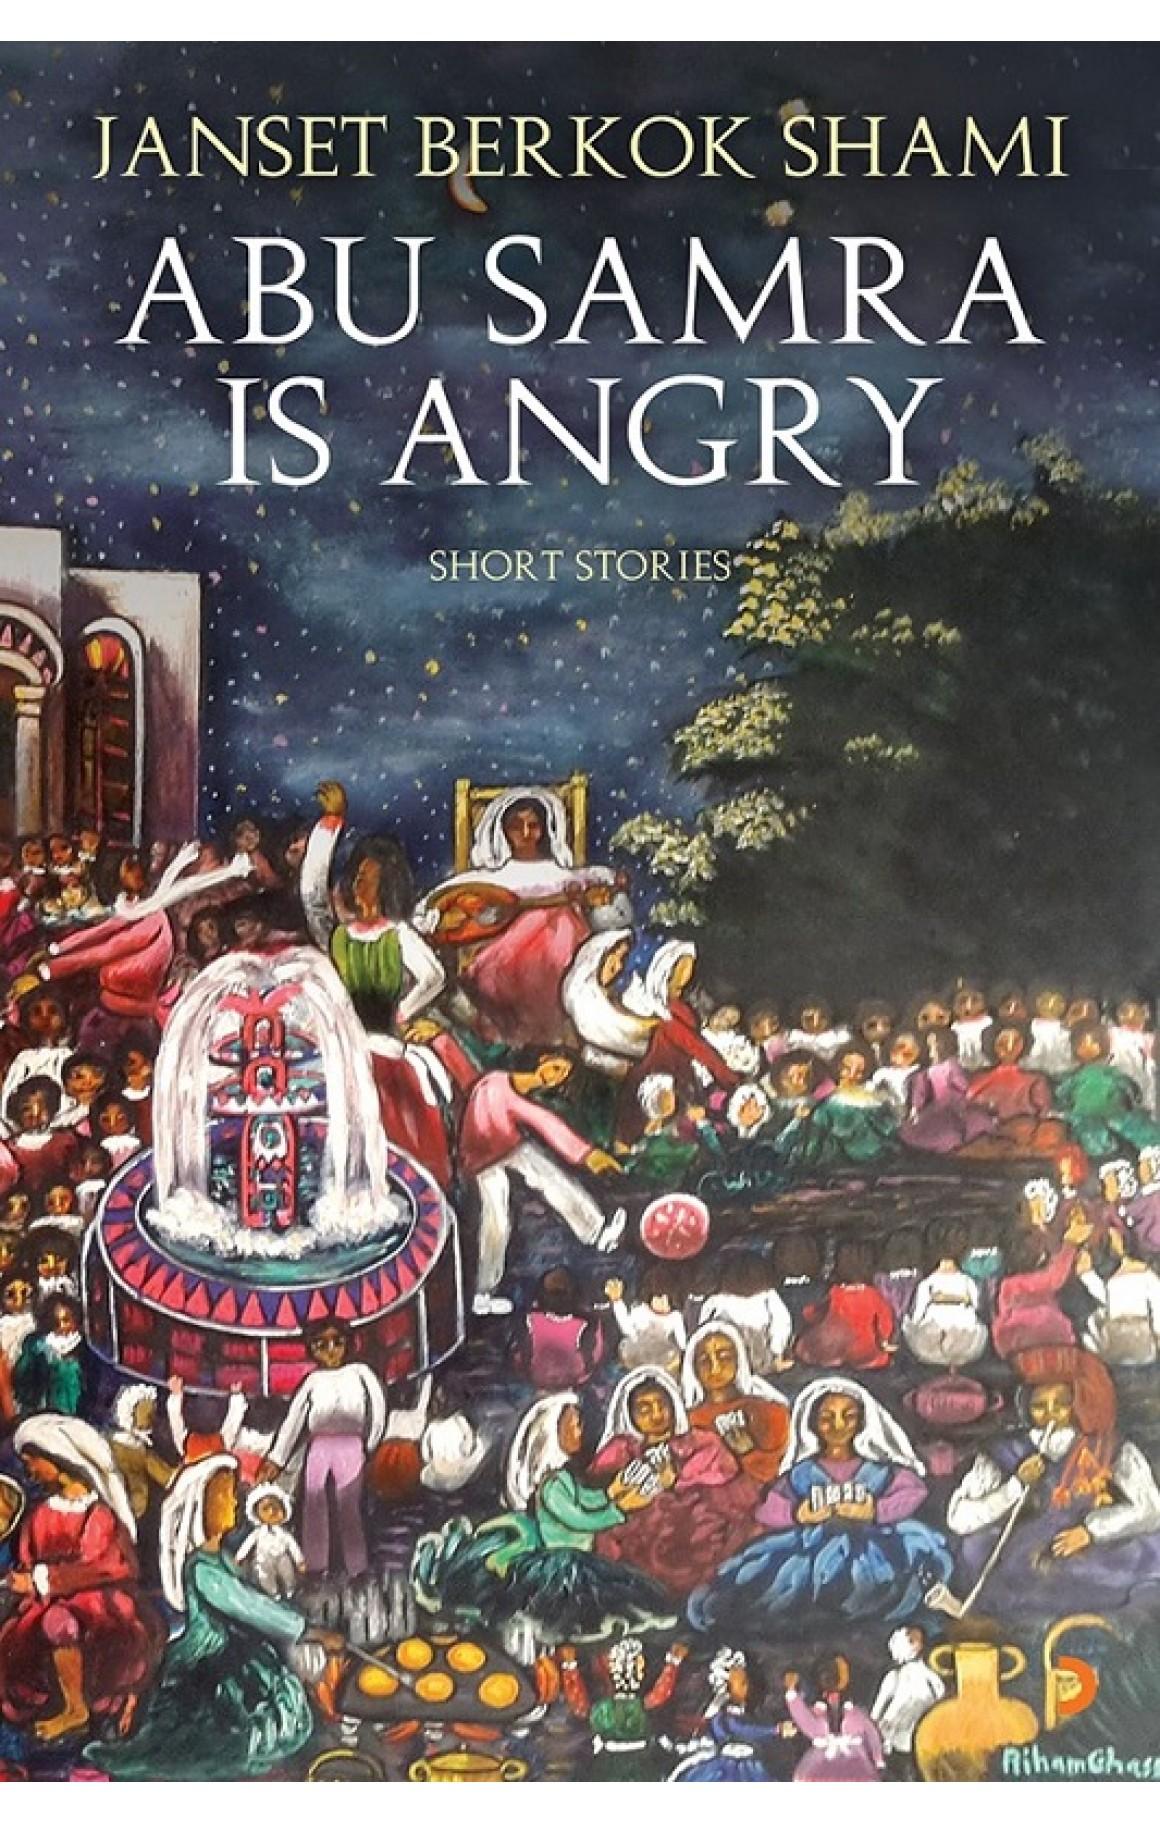 Abu Samra is Angry-Short Stories